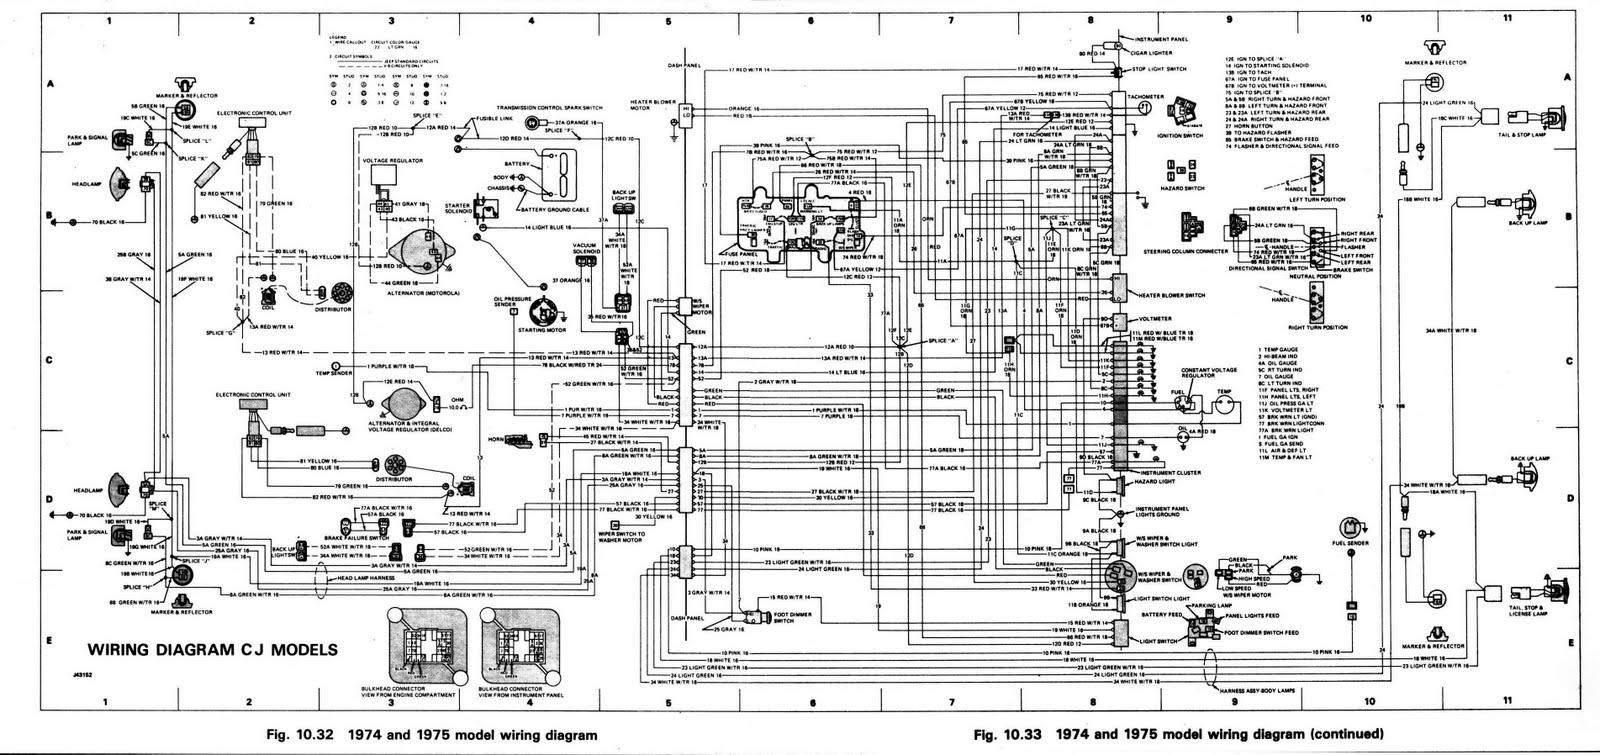 jeep cj wiringdiagram image details rh motogurumag com M38 Jeep Wiring Diagram M38 Jeep Wiring Diagram